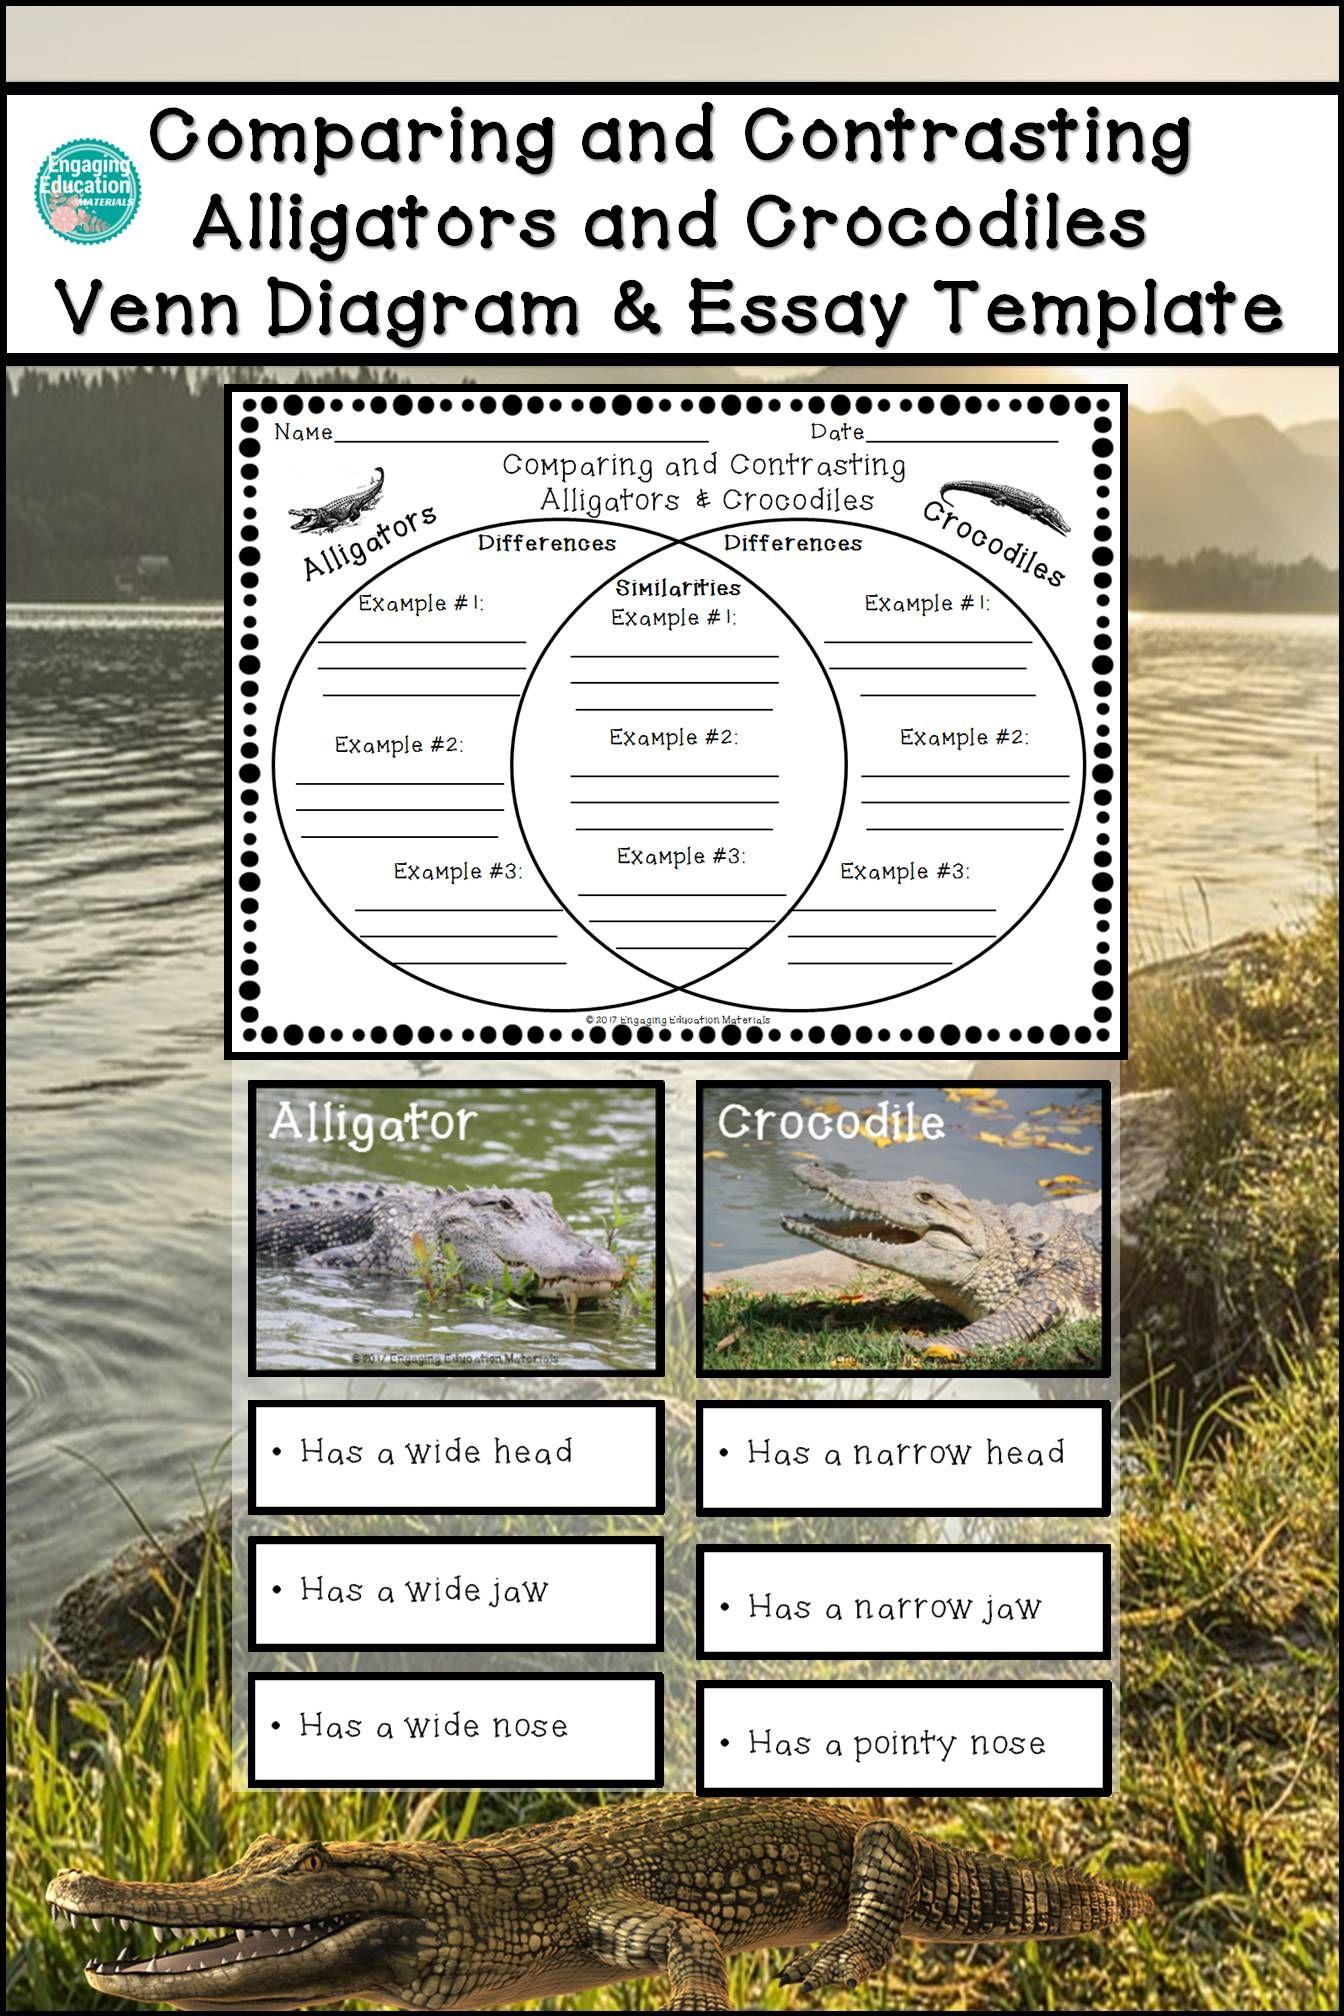 compare and contrast using venn diagram 2000 ford explorer wiring comparing contrasting alligators crocodiles